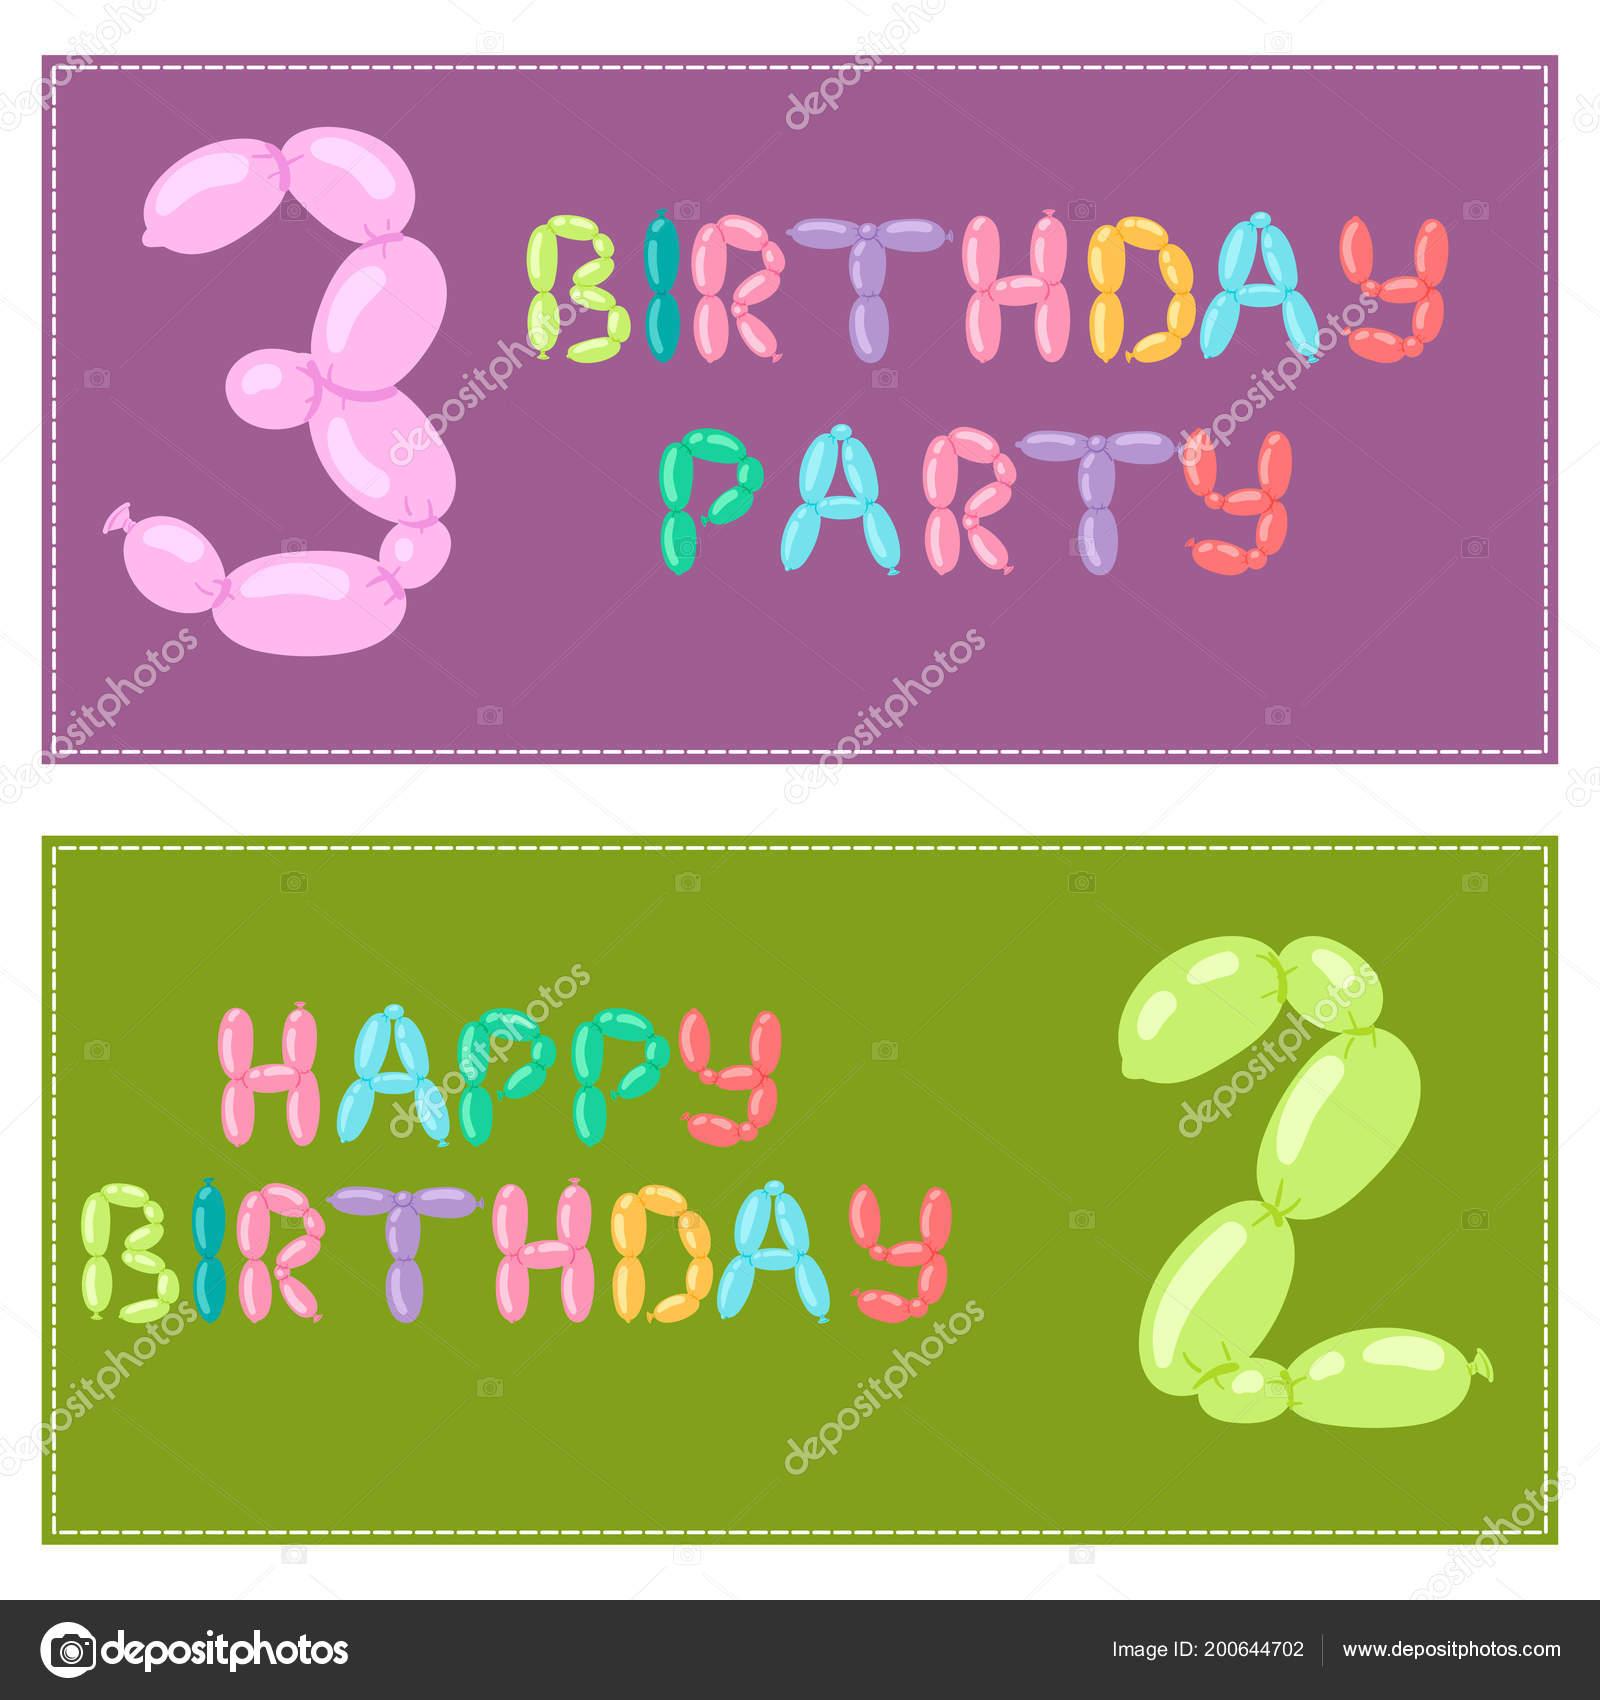 English balloon colorful birthday cards vector holidays party english balloon colorful birthday cards vector holidays party education ozone type greeting helium cartoon festive decoration m4hsunfo